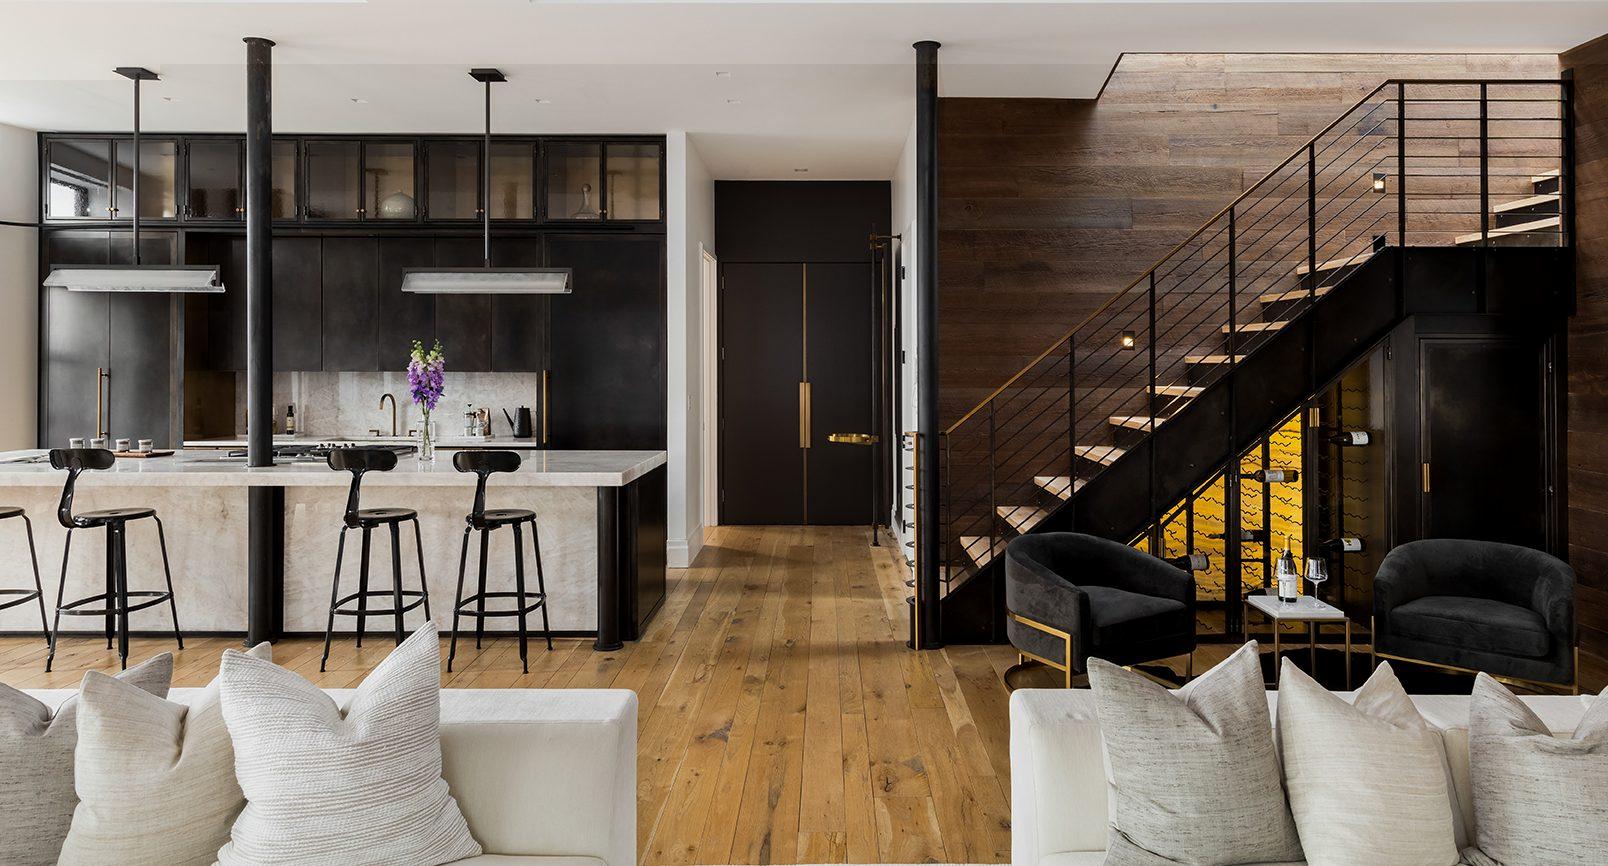 Designed by Ychelle Interior Design / Kathleen Ryan